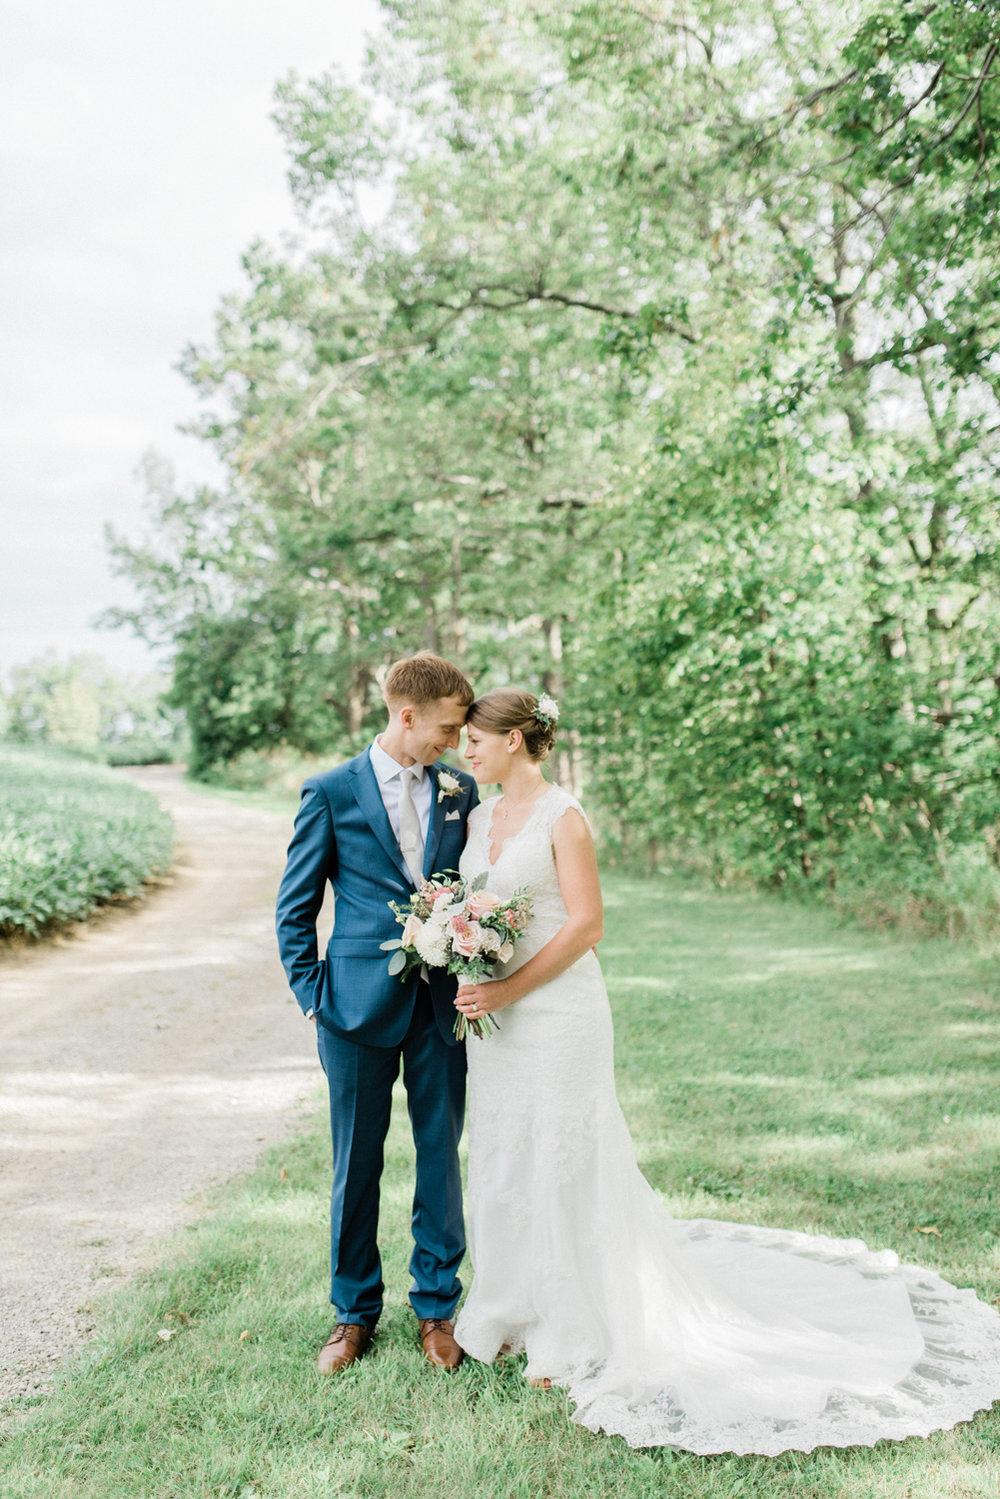 Dyments Wedding, Hamilton Wedding Photographer